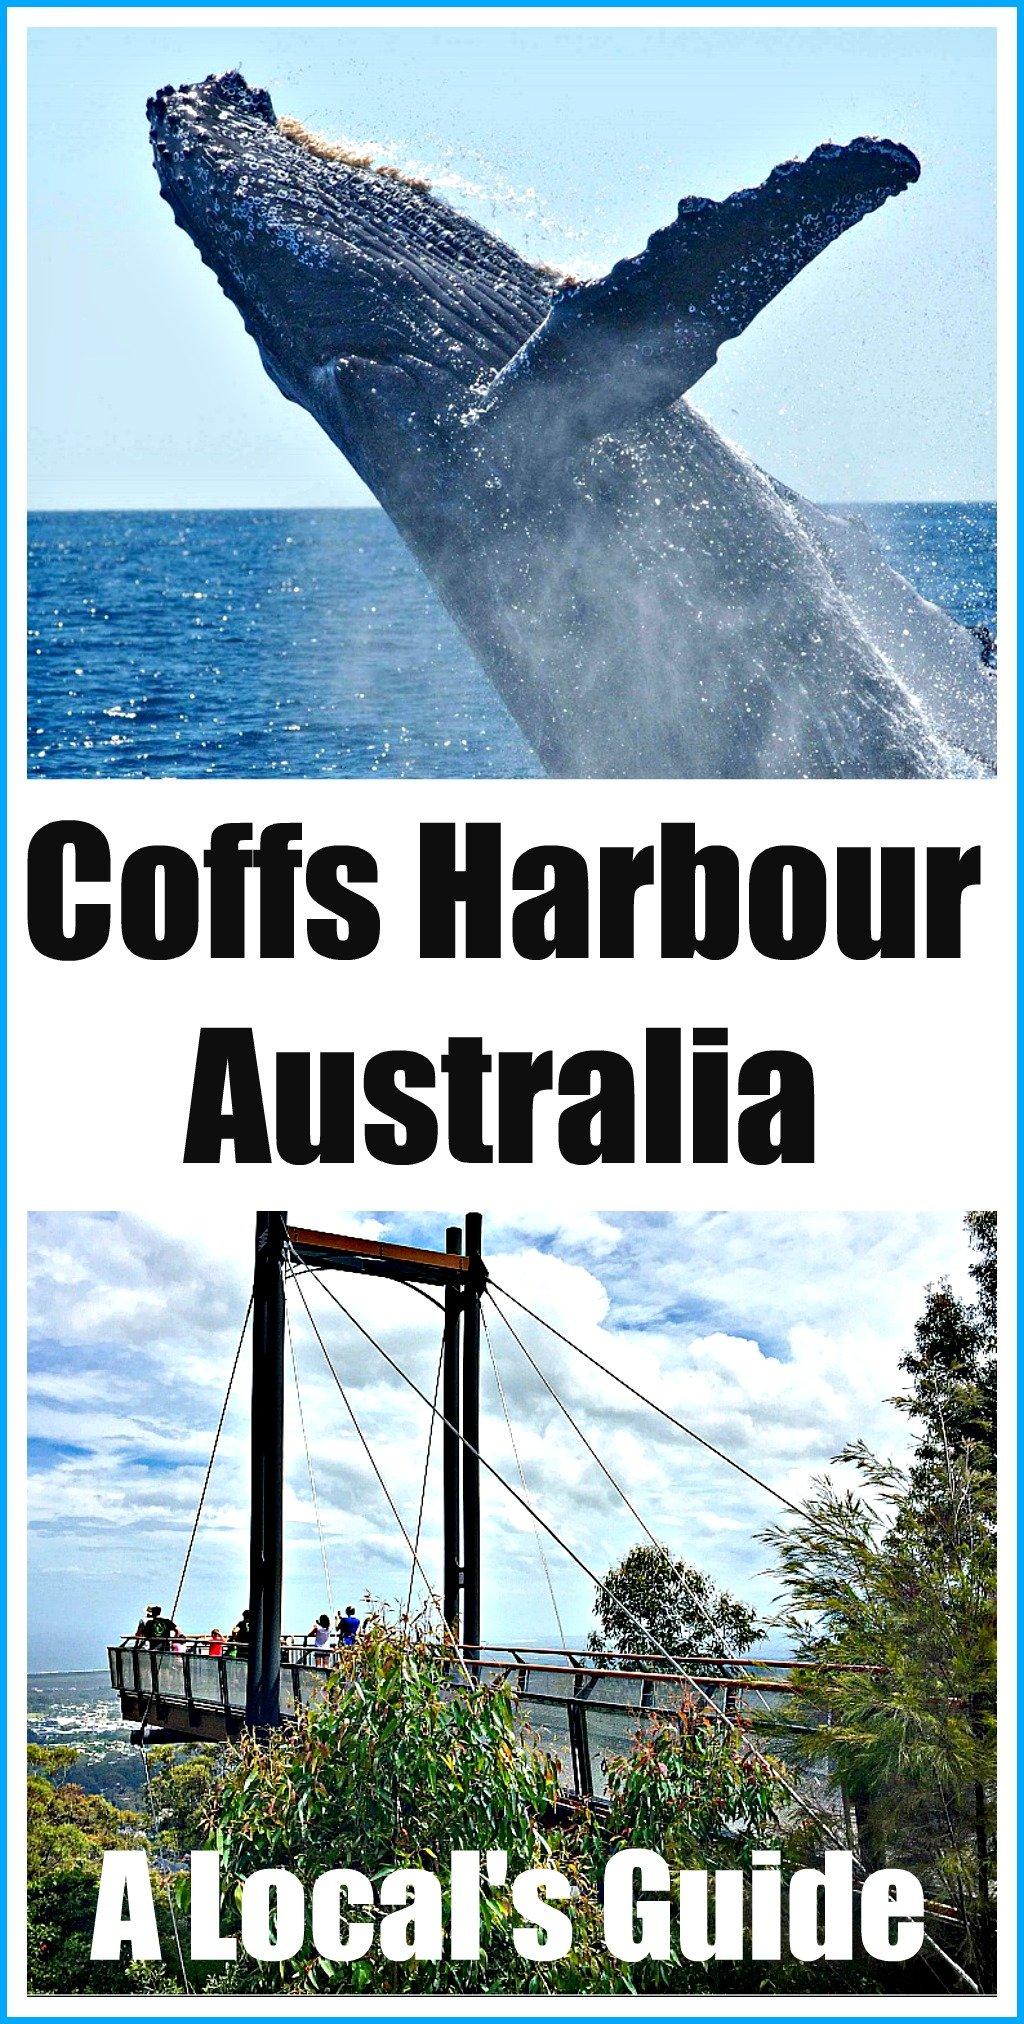 Coffs Harbour Australia A Local's Guide